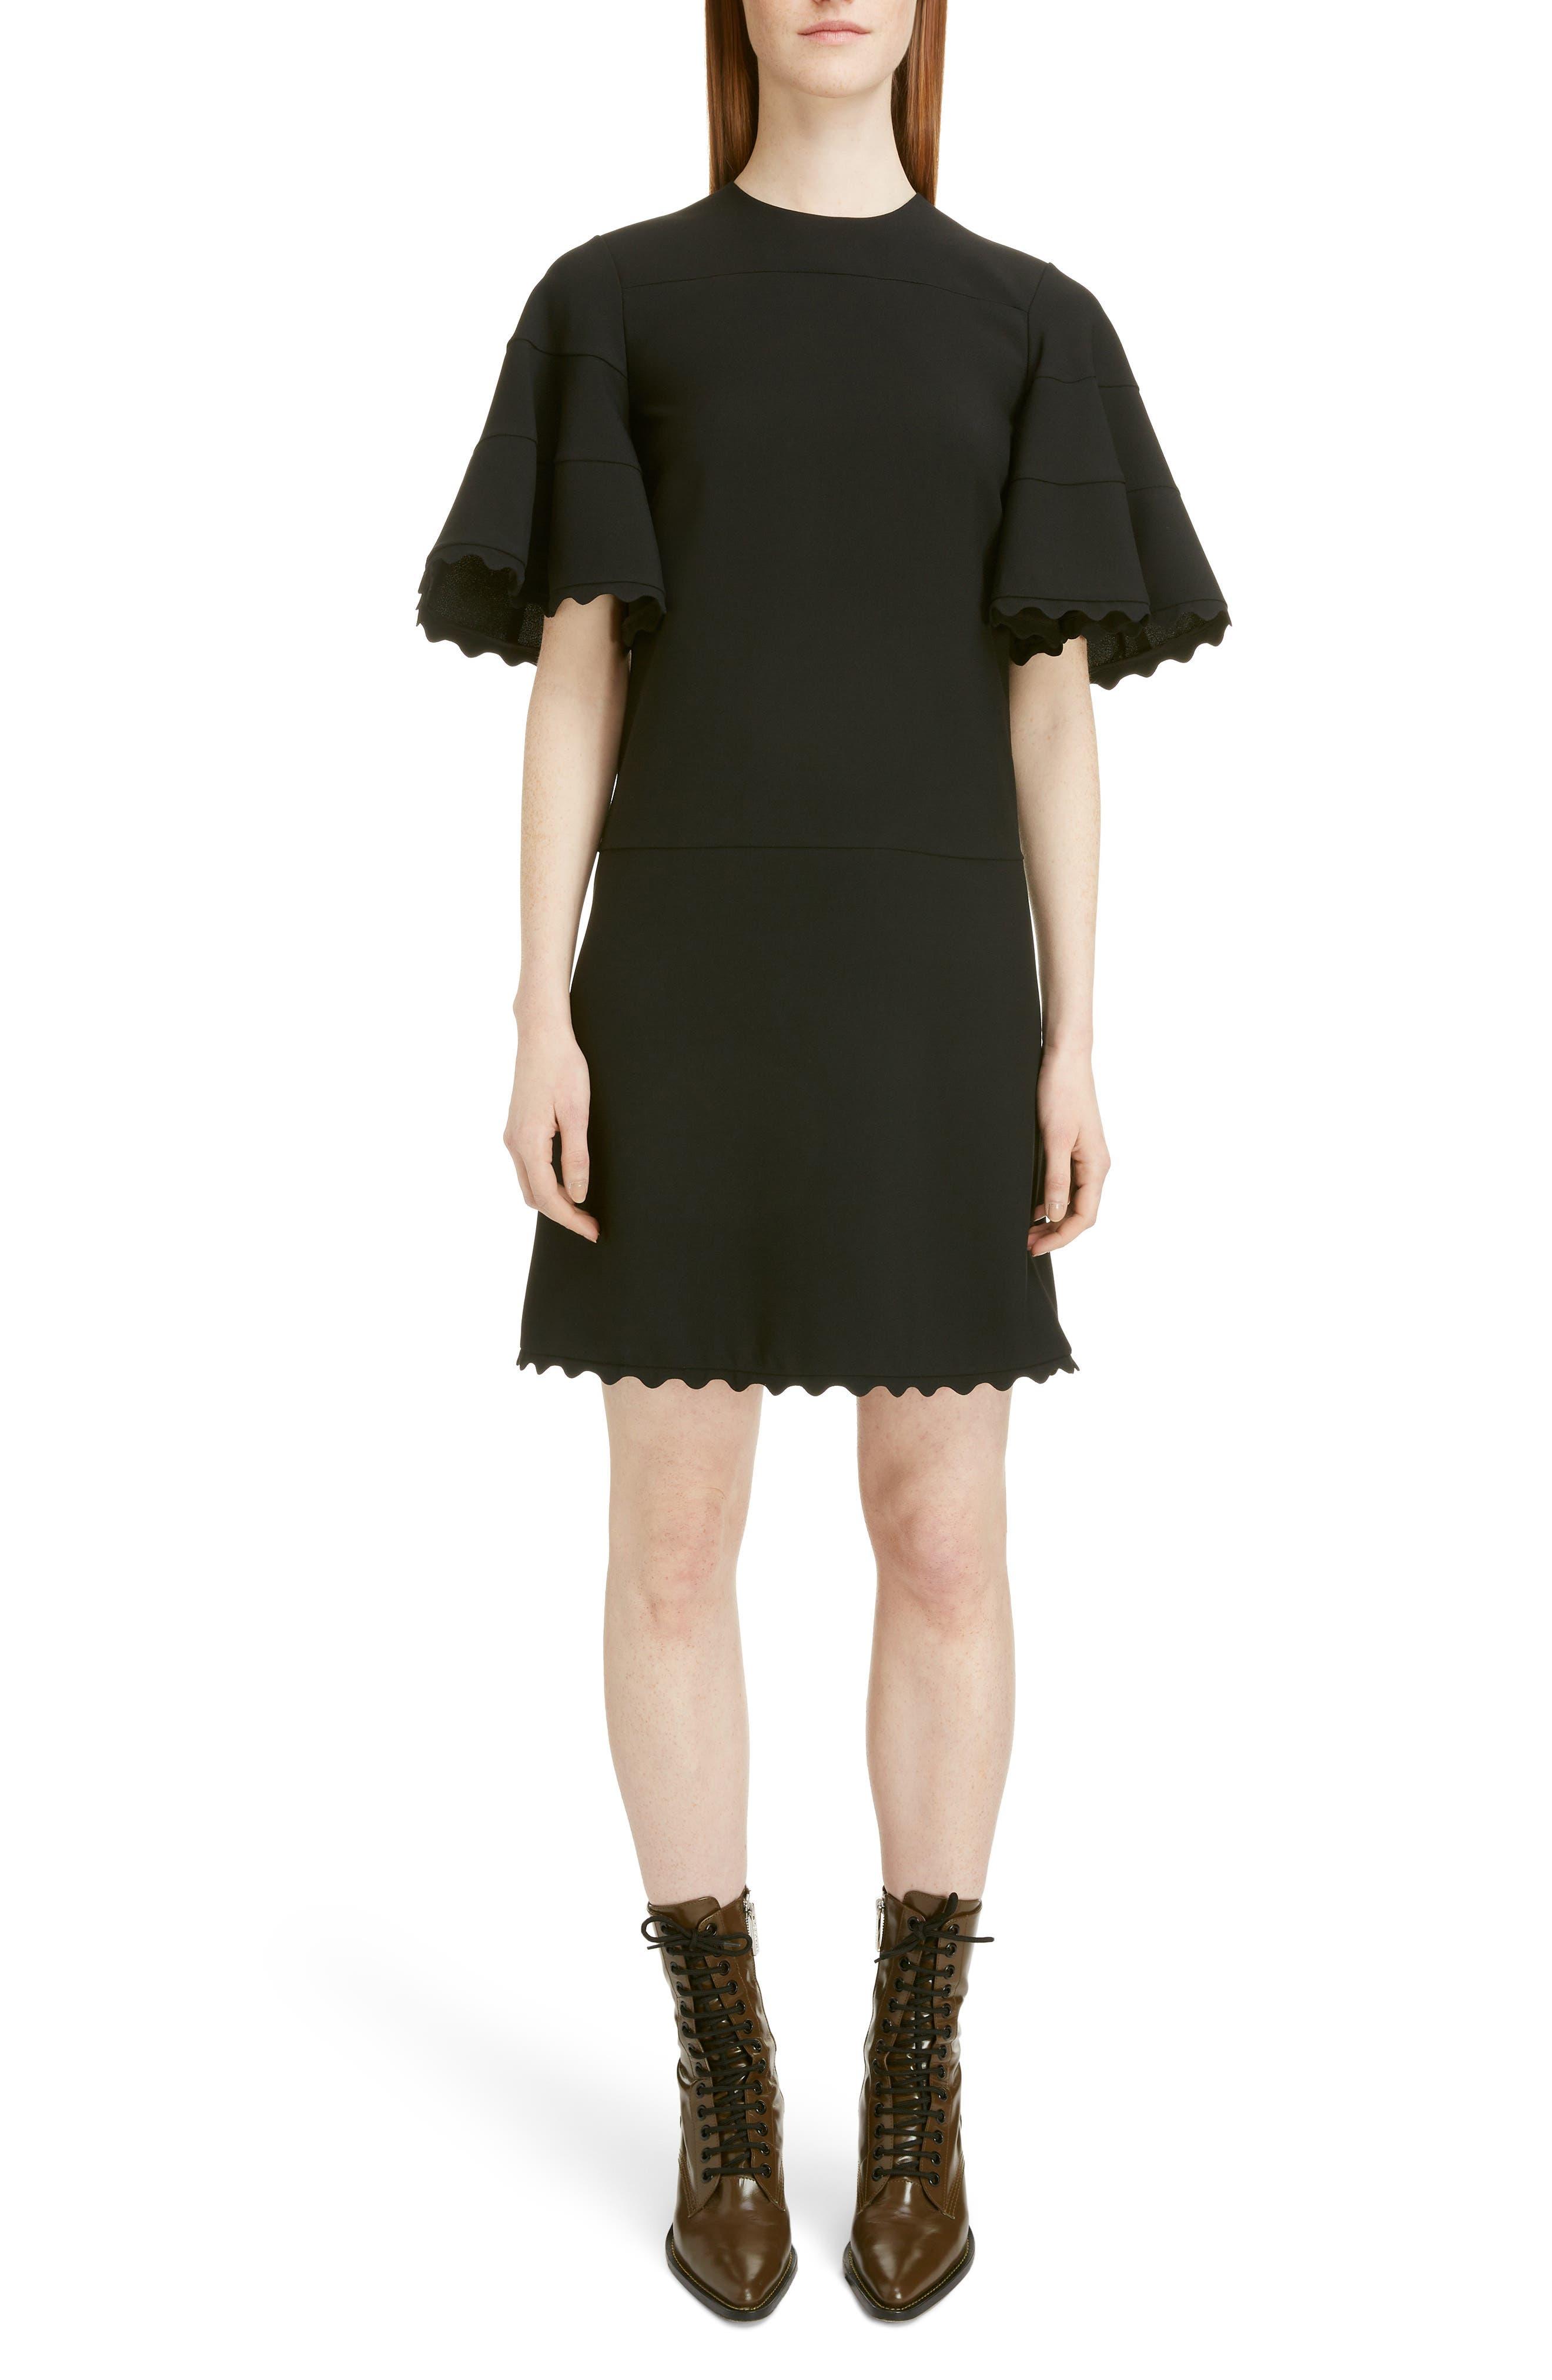 Image of Chloe Scallop Bell Sleeve Mini Dress